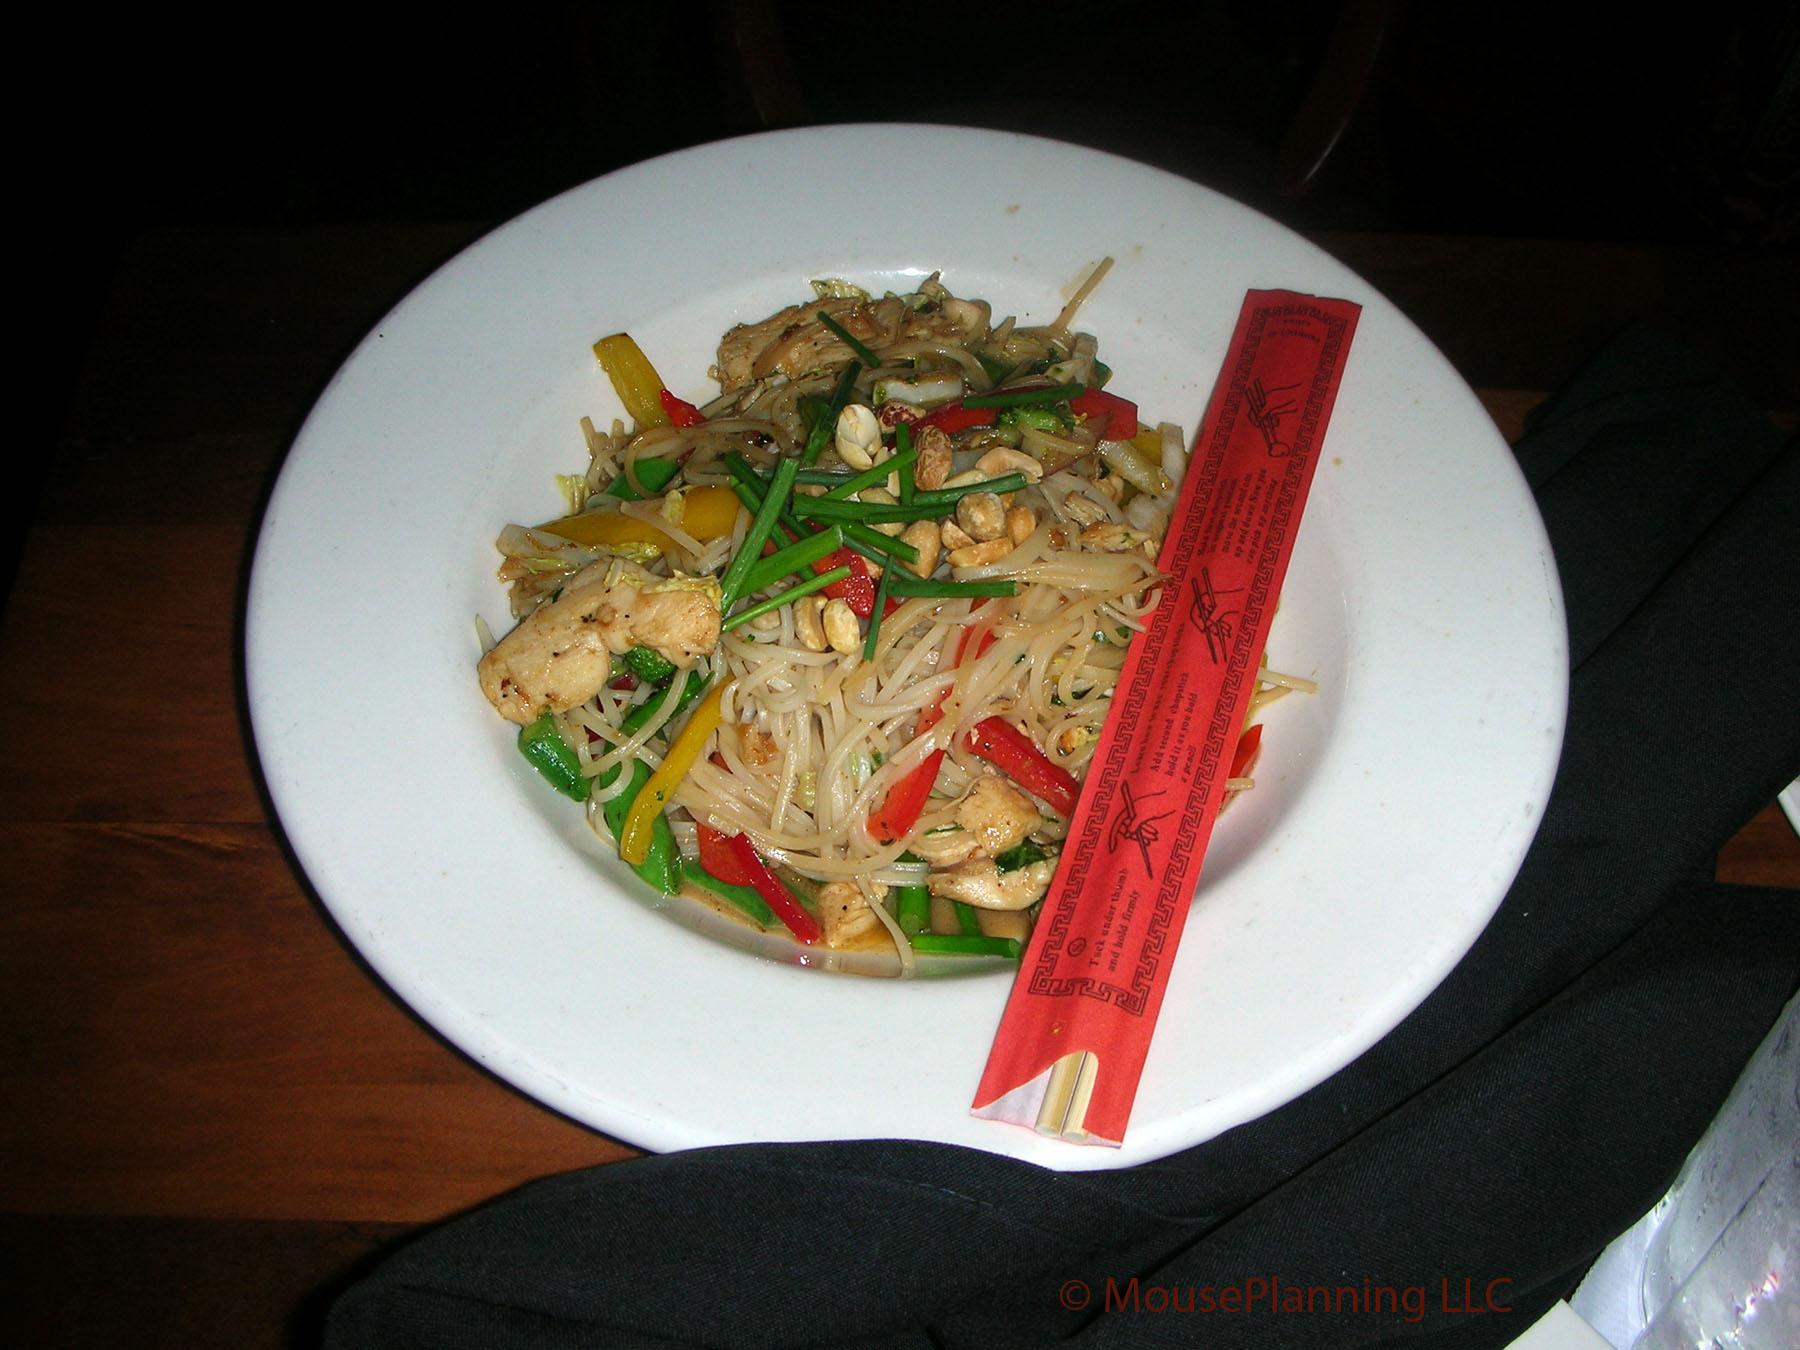 Kona Cafe Dinner - Pan-Asian Noodles